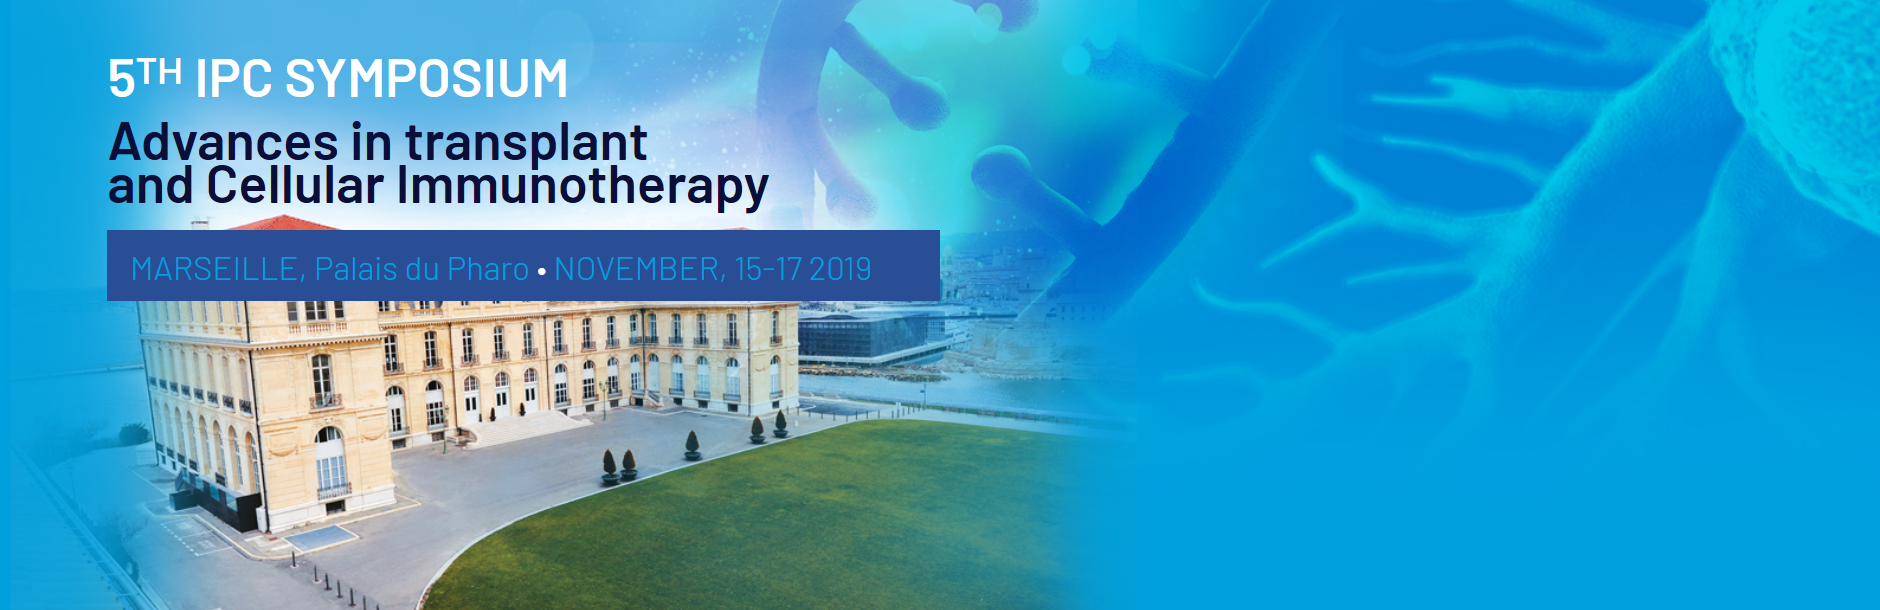 Agence Design Industriel Marseille 5th ipc symposium : advances in transplant and cellular